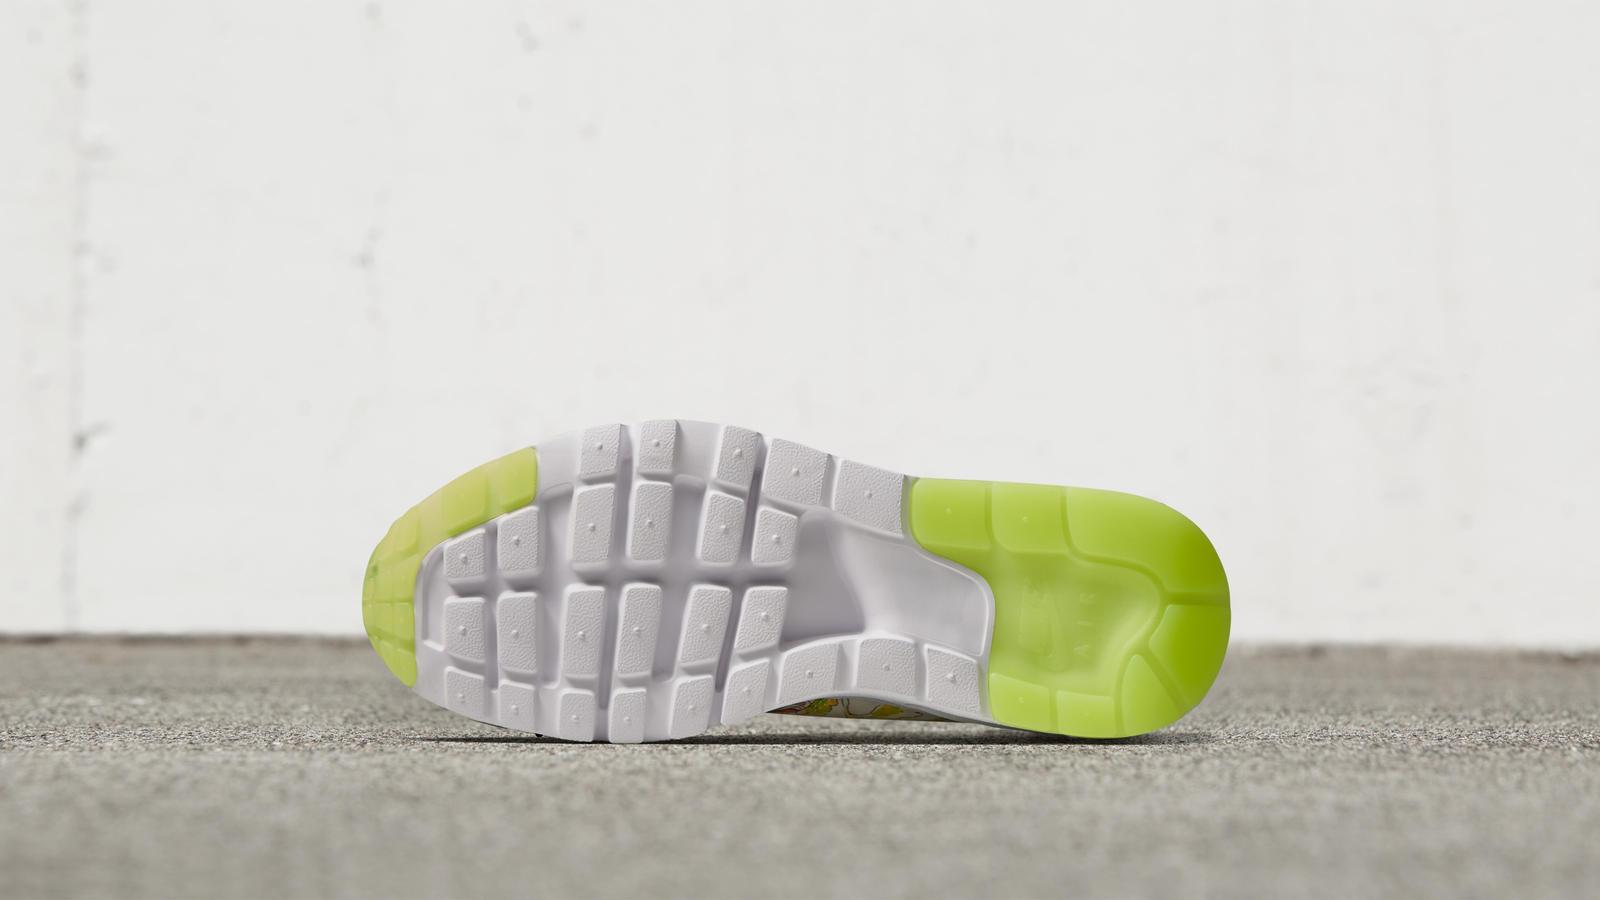 NikeCourt x Liberty Air Max 1 Nike News